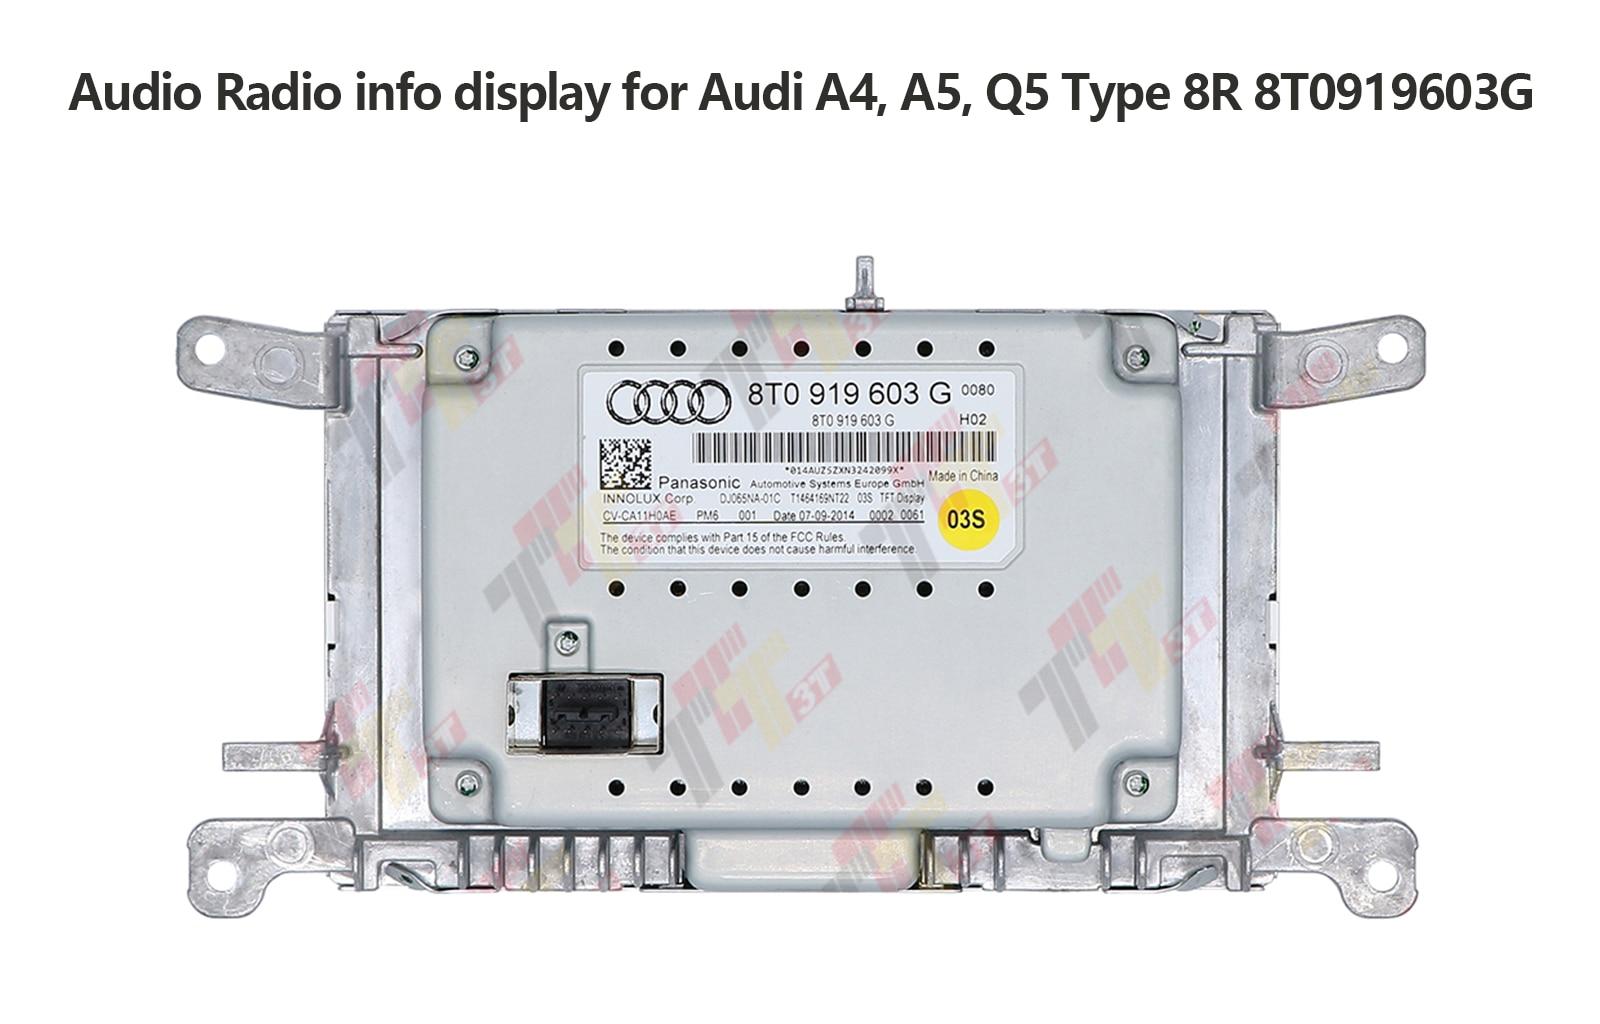 Monitor Info Dash Radio MMI LCD Display Screen for Audi A4 B8 A5 Q5 RS5 S4